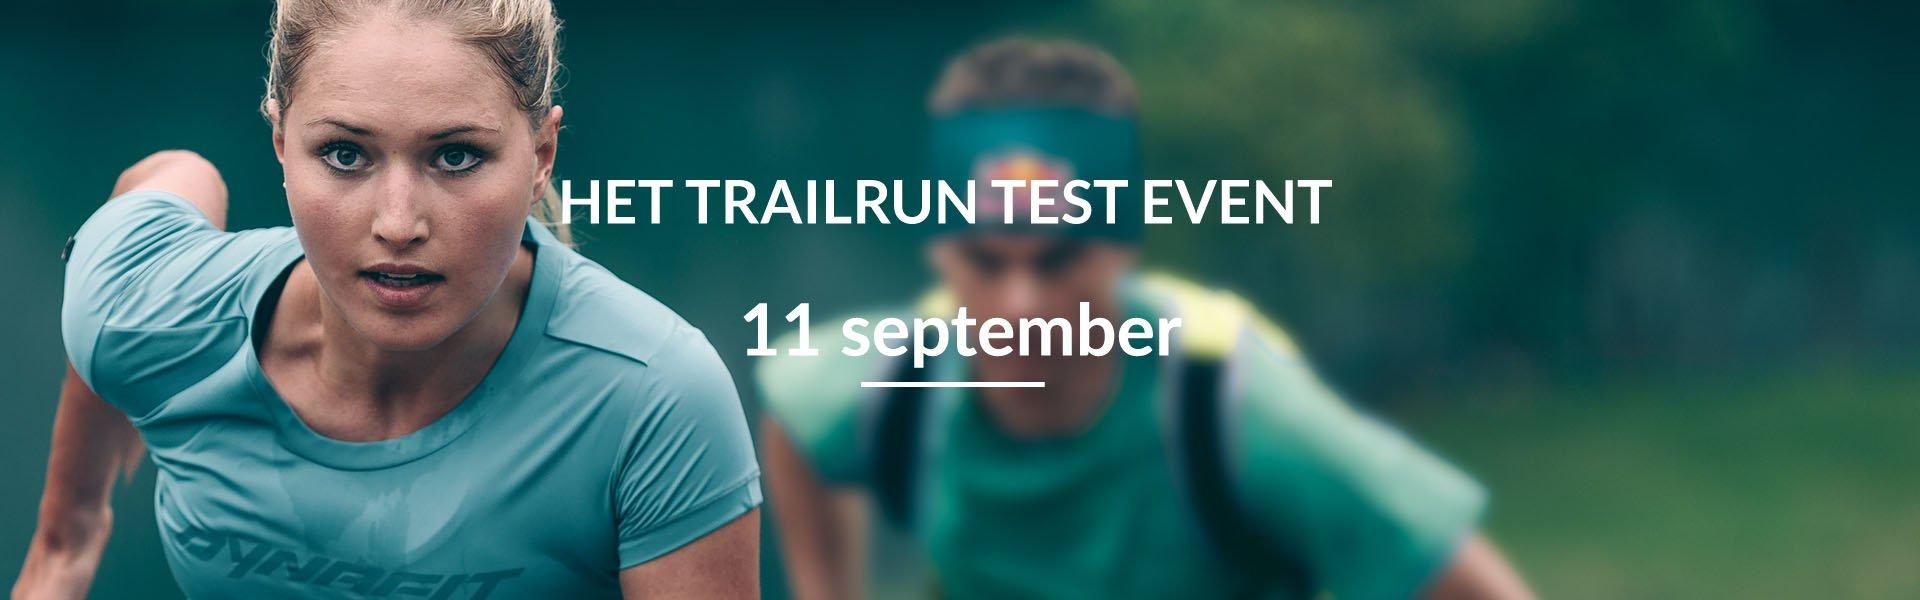 trailrun-event